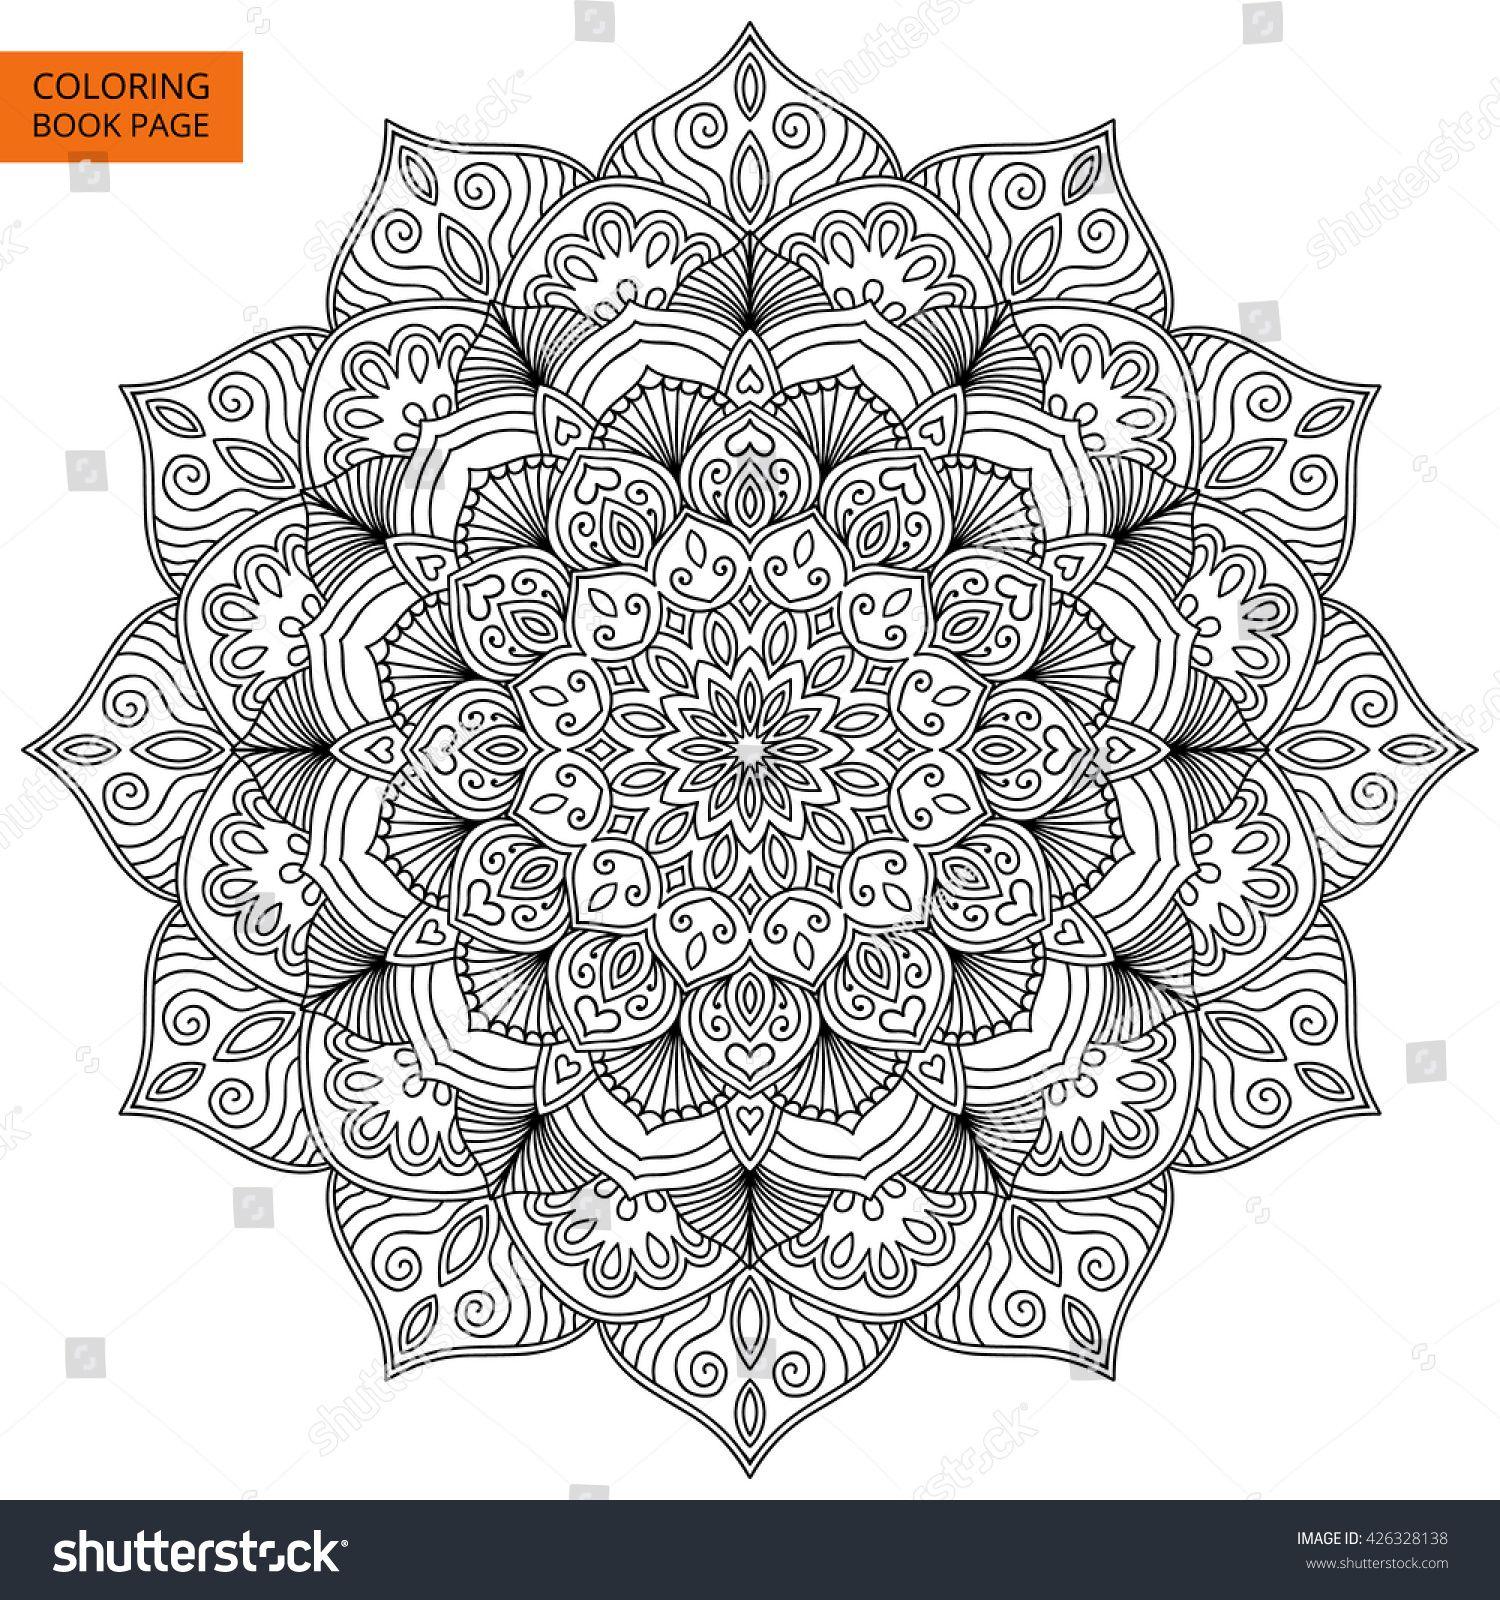 39++ Coloriage anti stress tatouage ideas in 2021